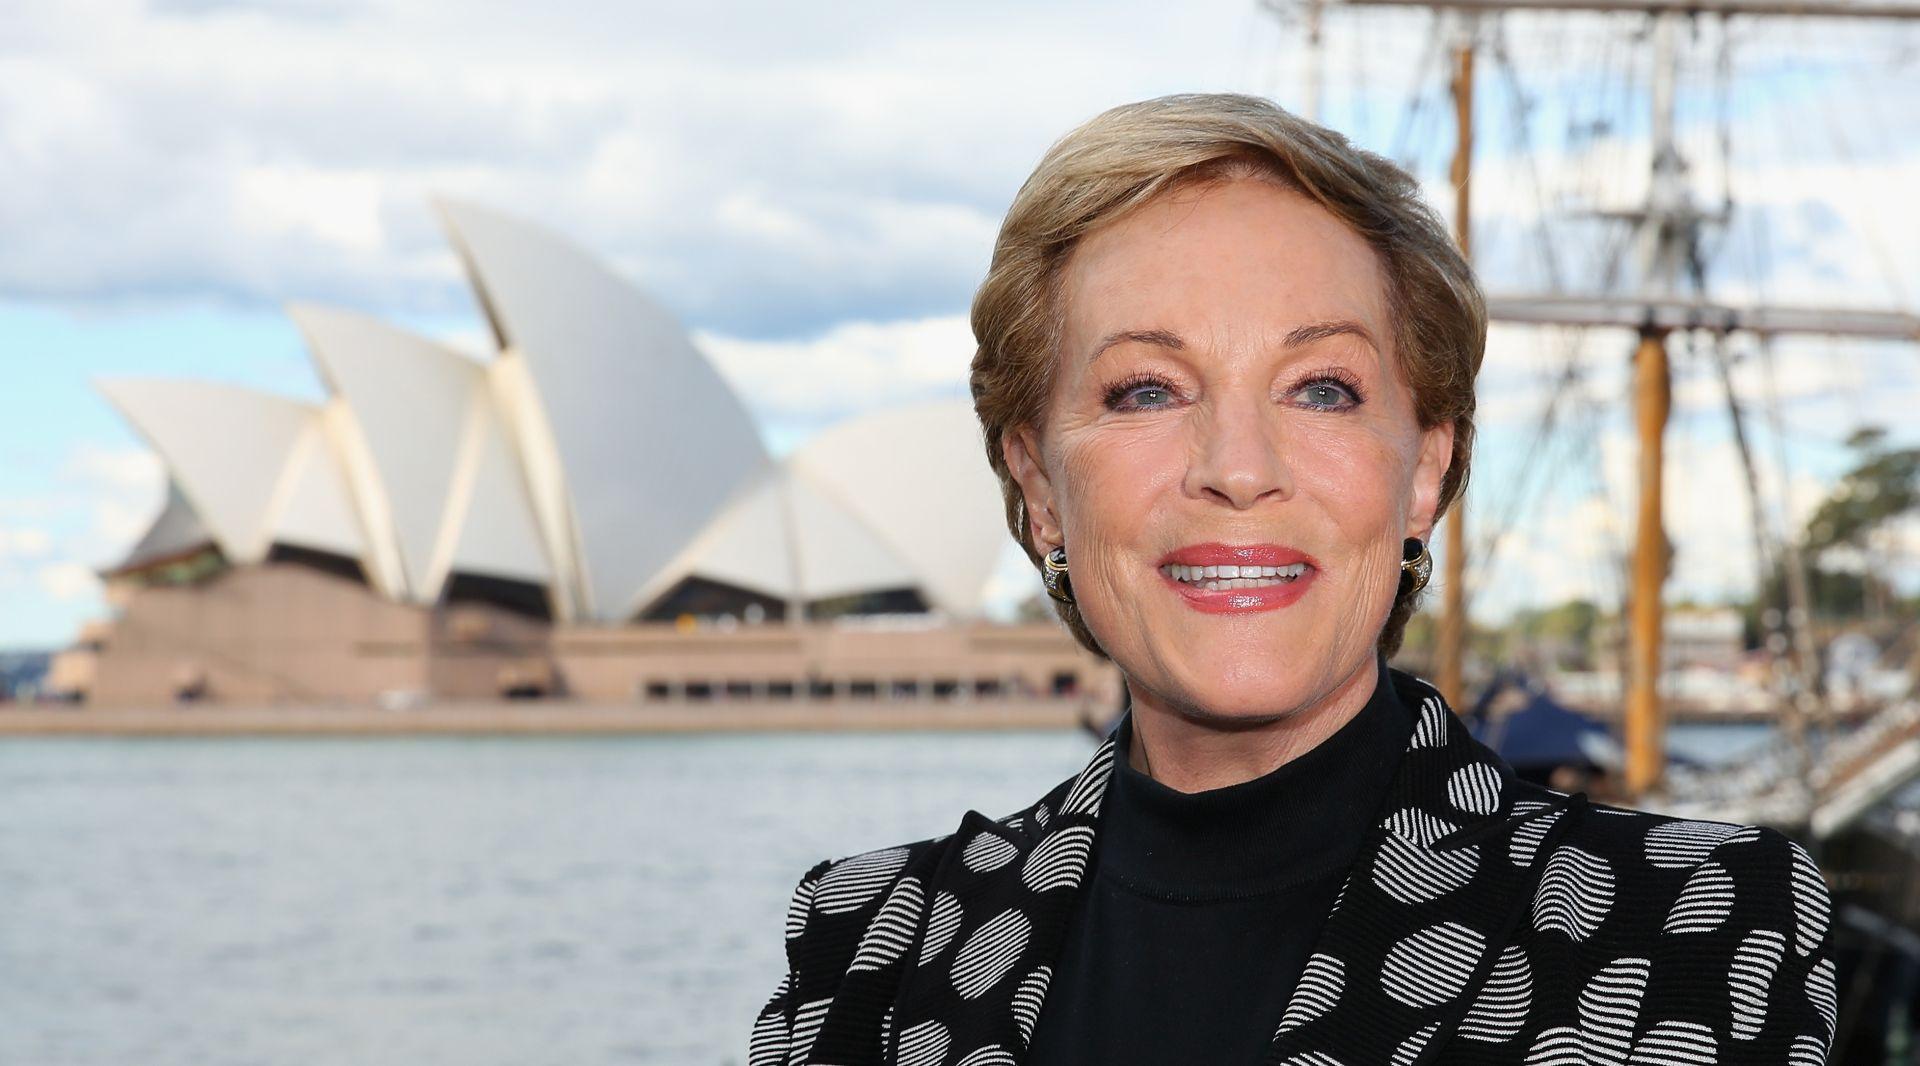 POVRATAK POČECIMA Julie Andrews režirat će mjuzikl 'My Fair Lady'